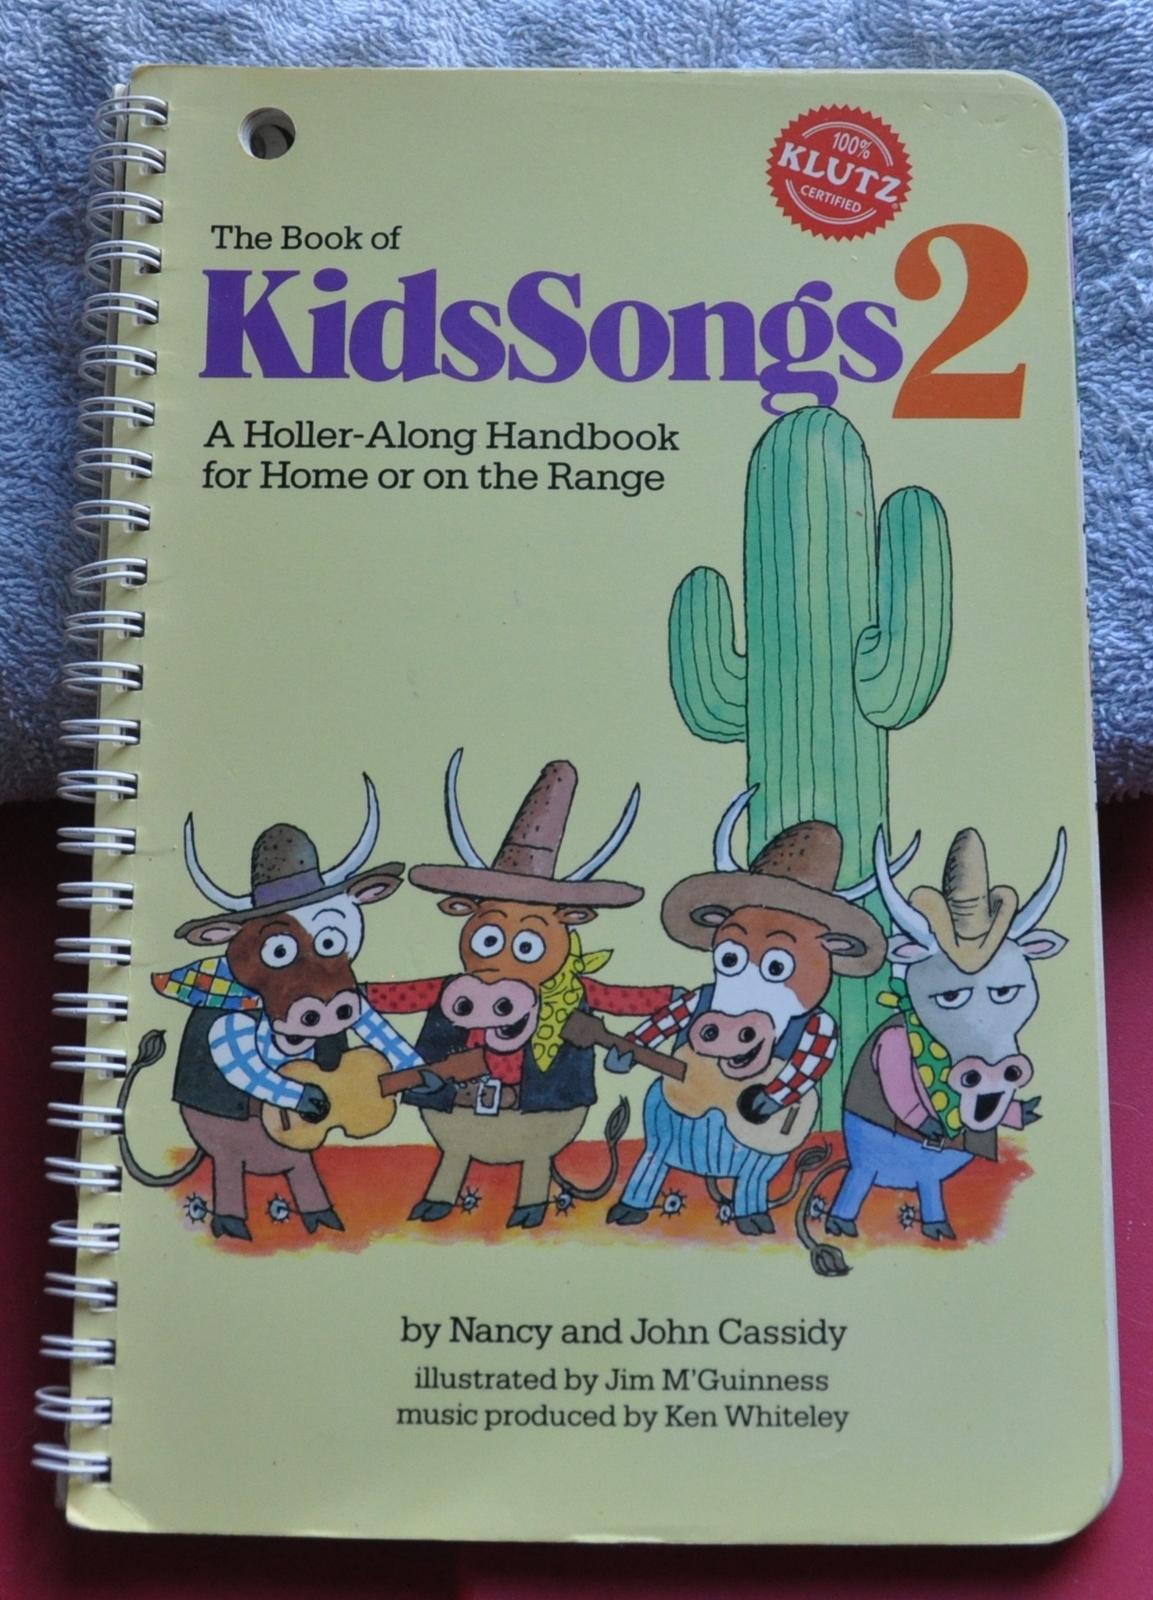 KLUTZ - Book of Kids Songs KidsSongs Fun and 50 similar items